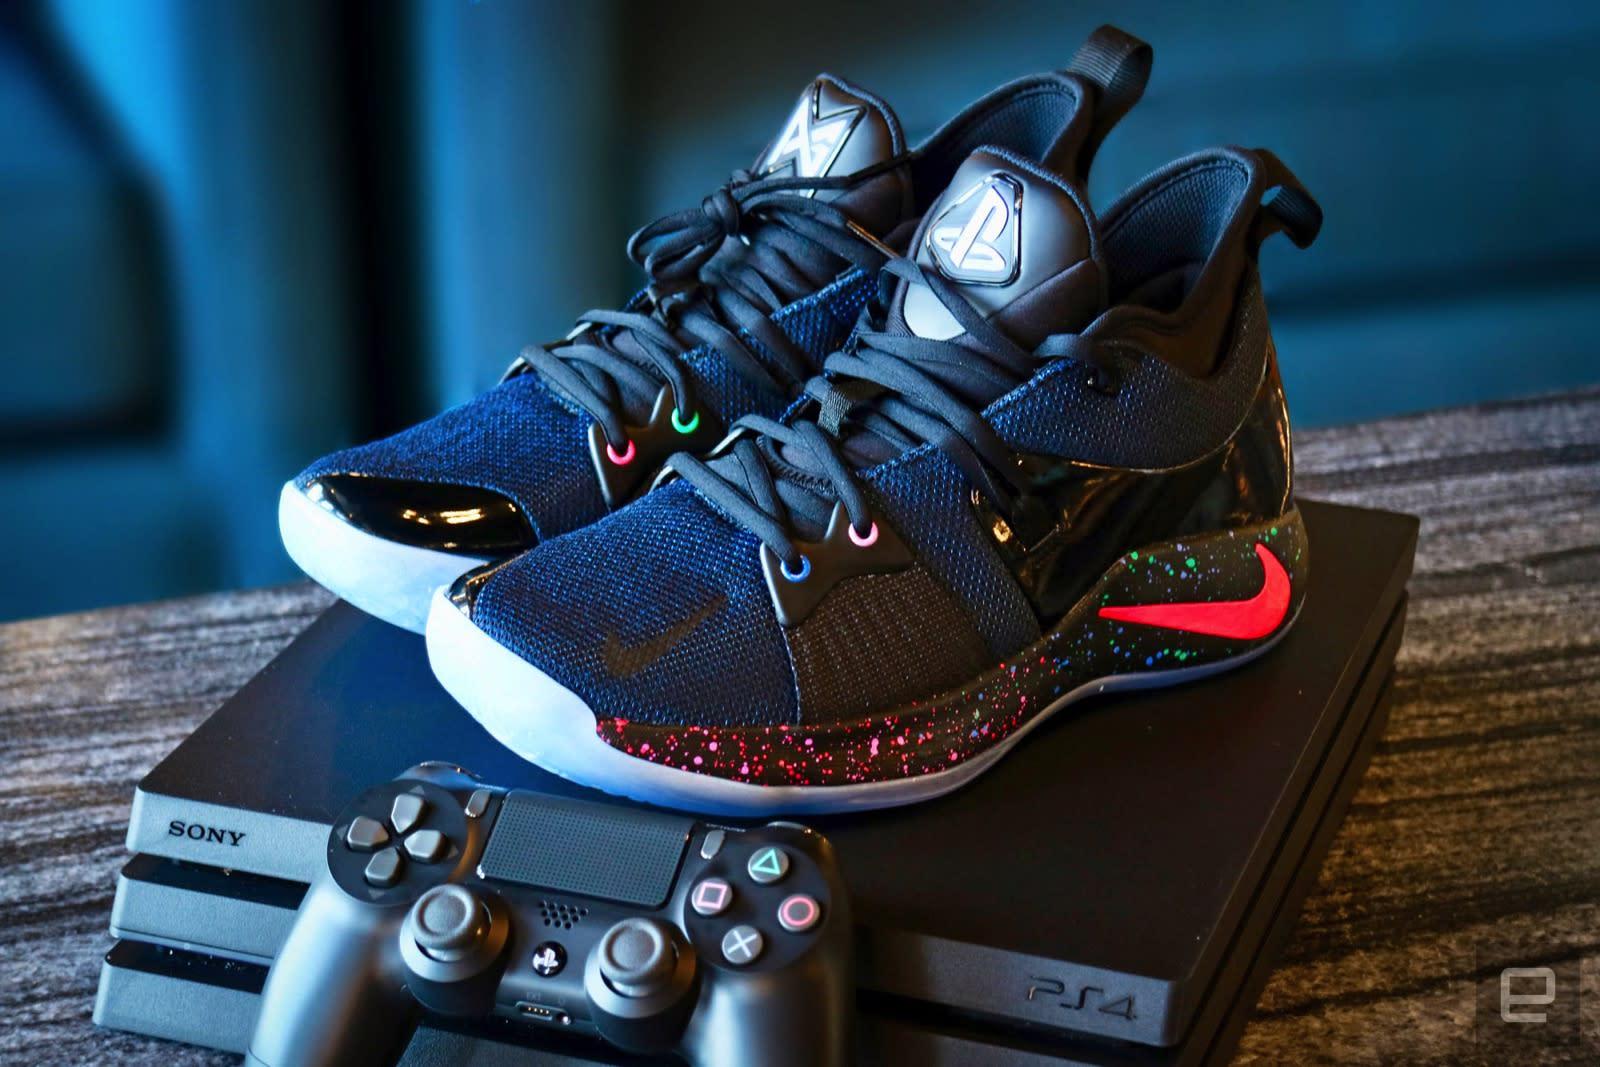 Nike's 'PlayStation' shoes make